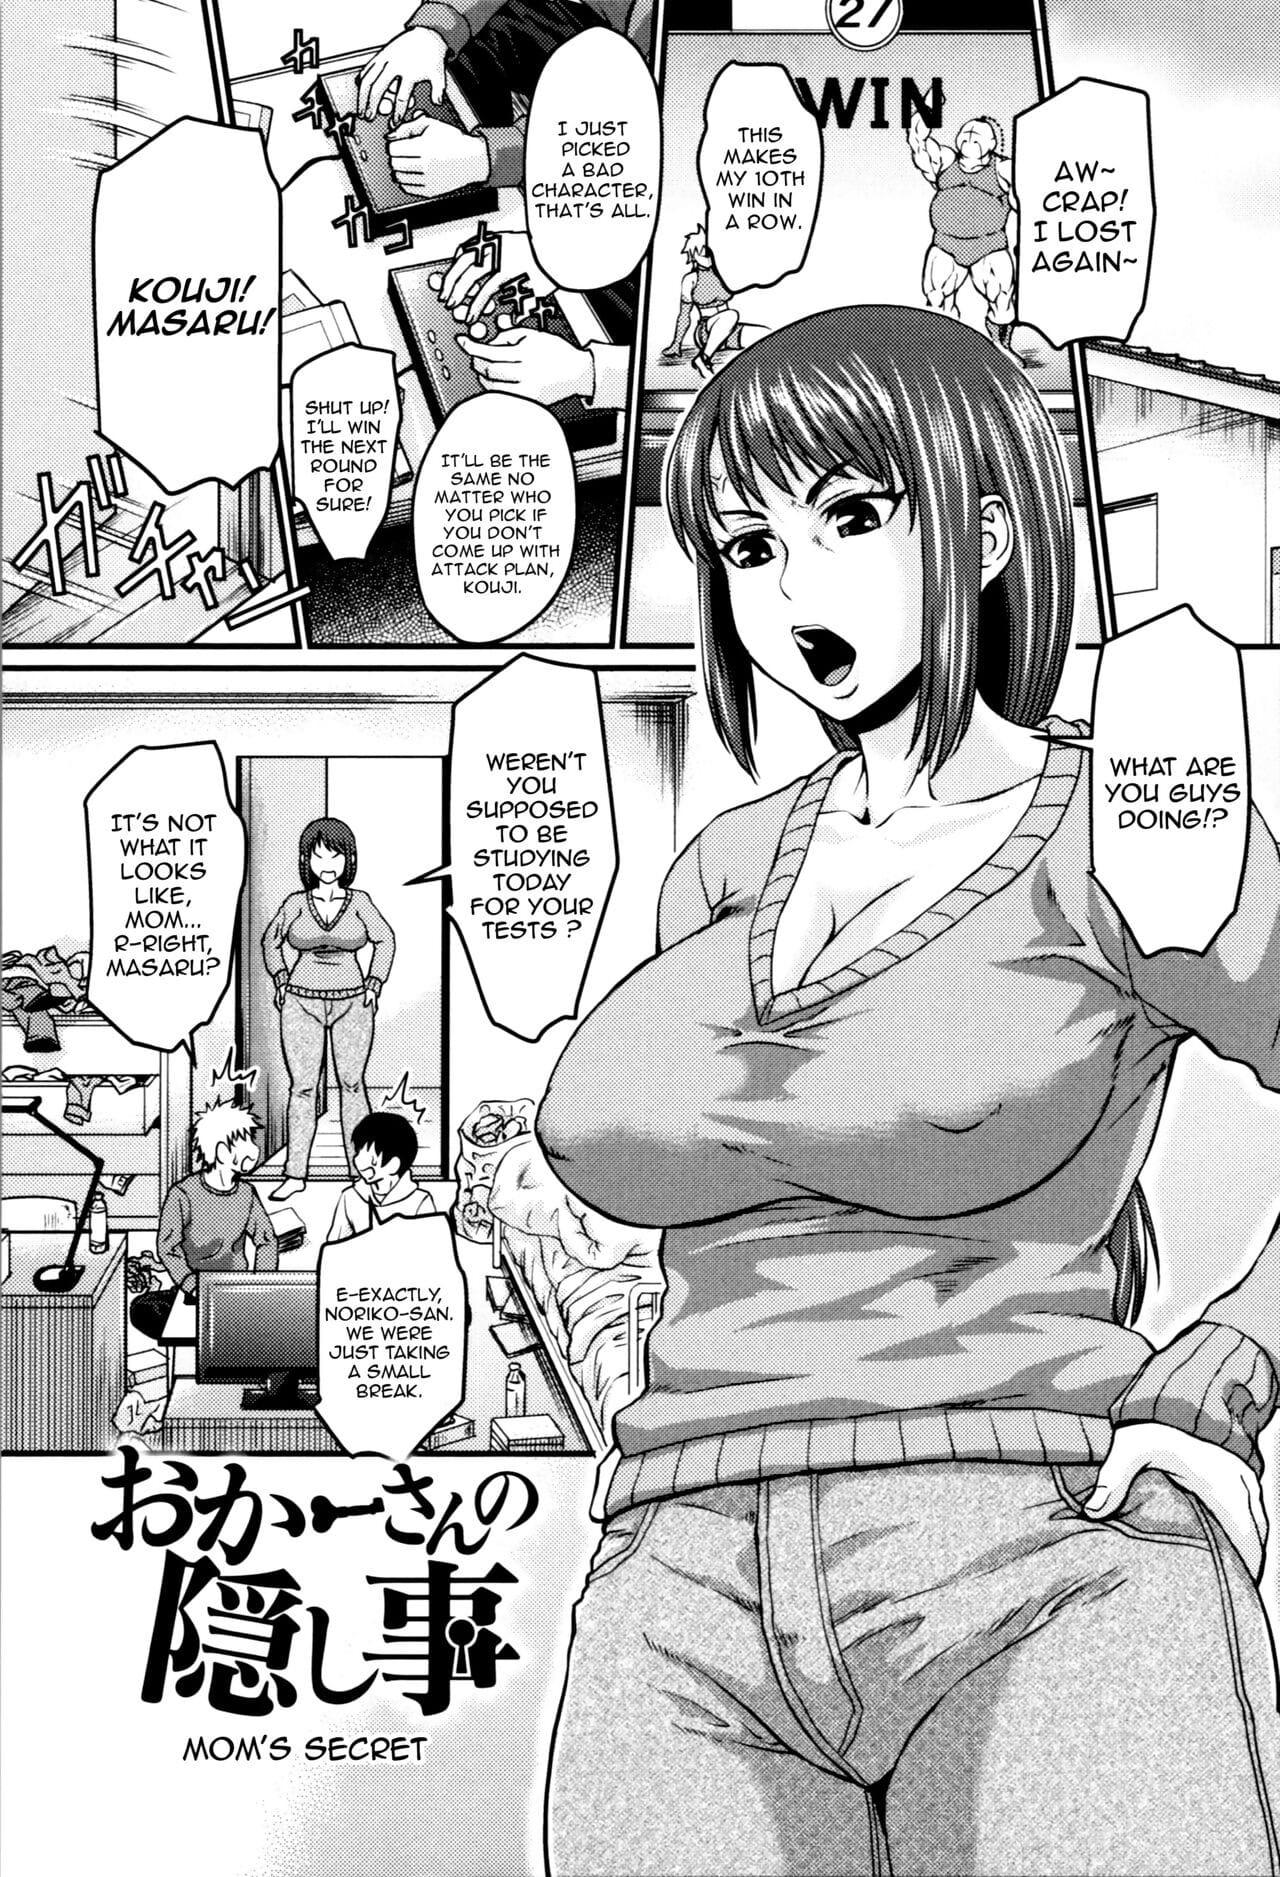 Okaa-san bantam Kakushigoto - Moms Obturate ignore